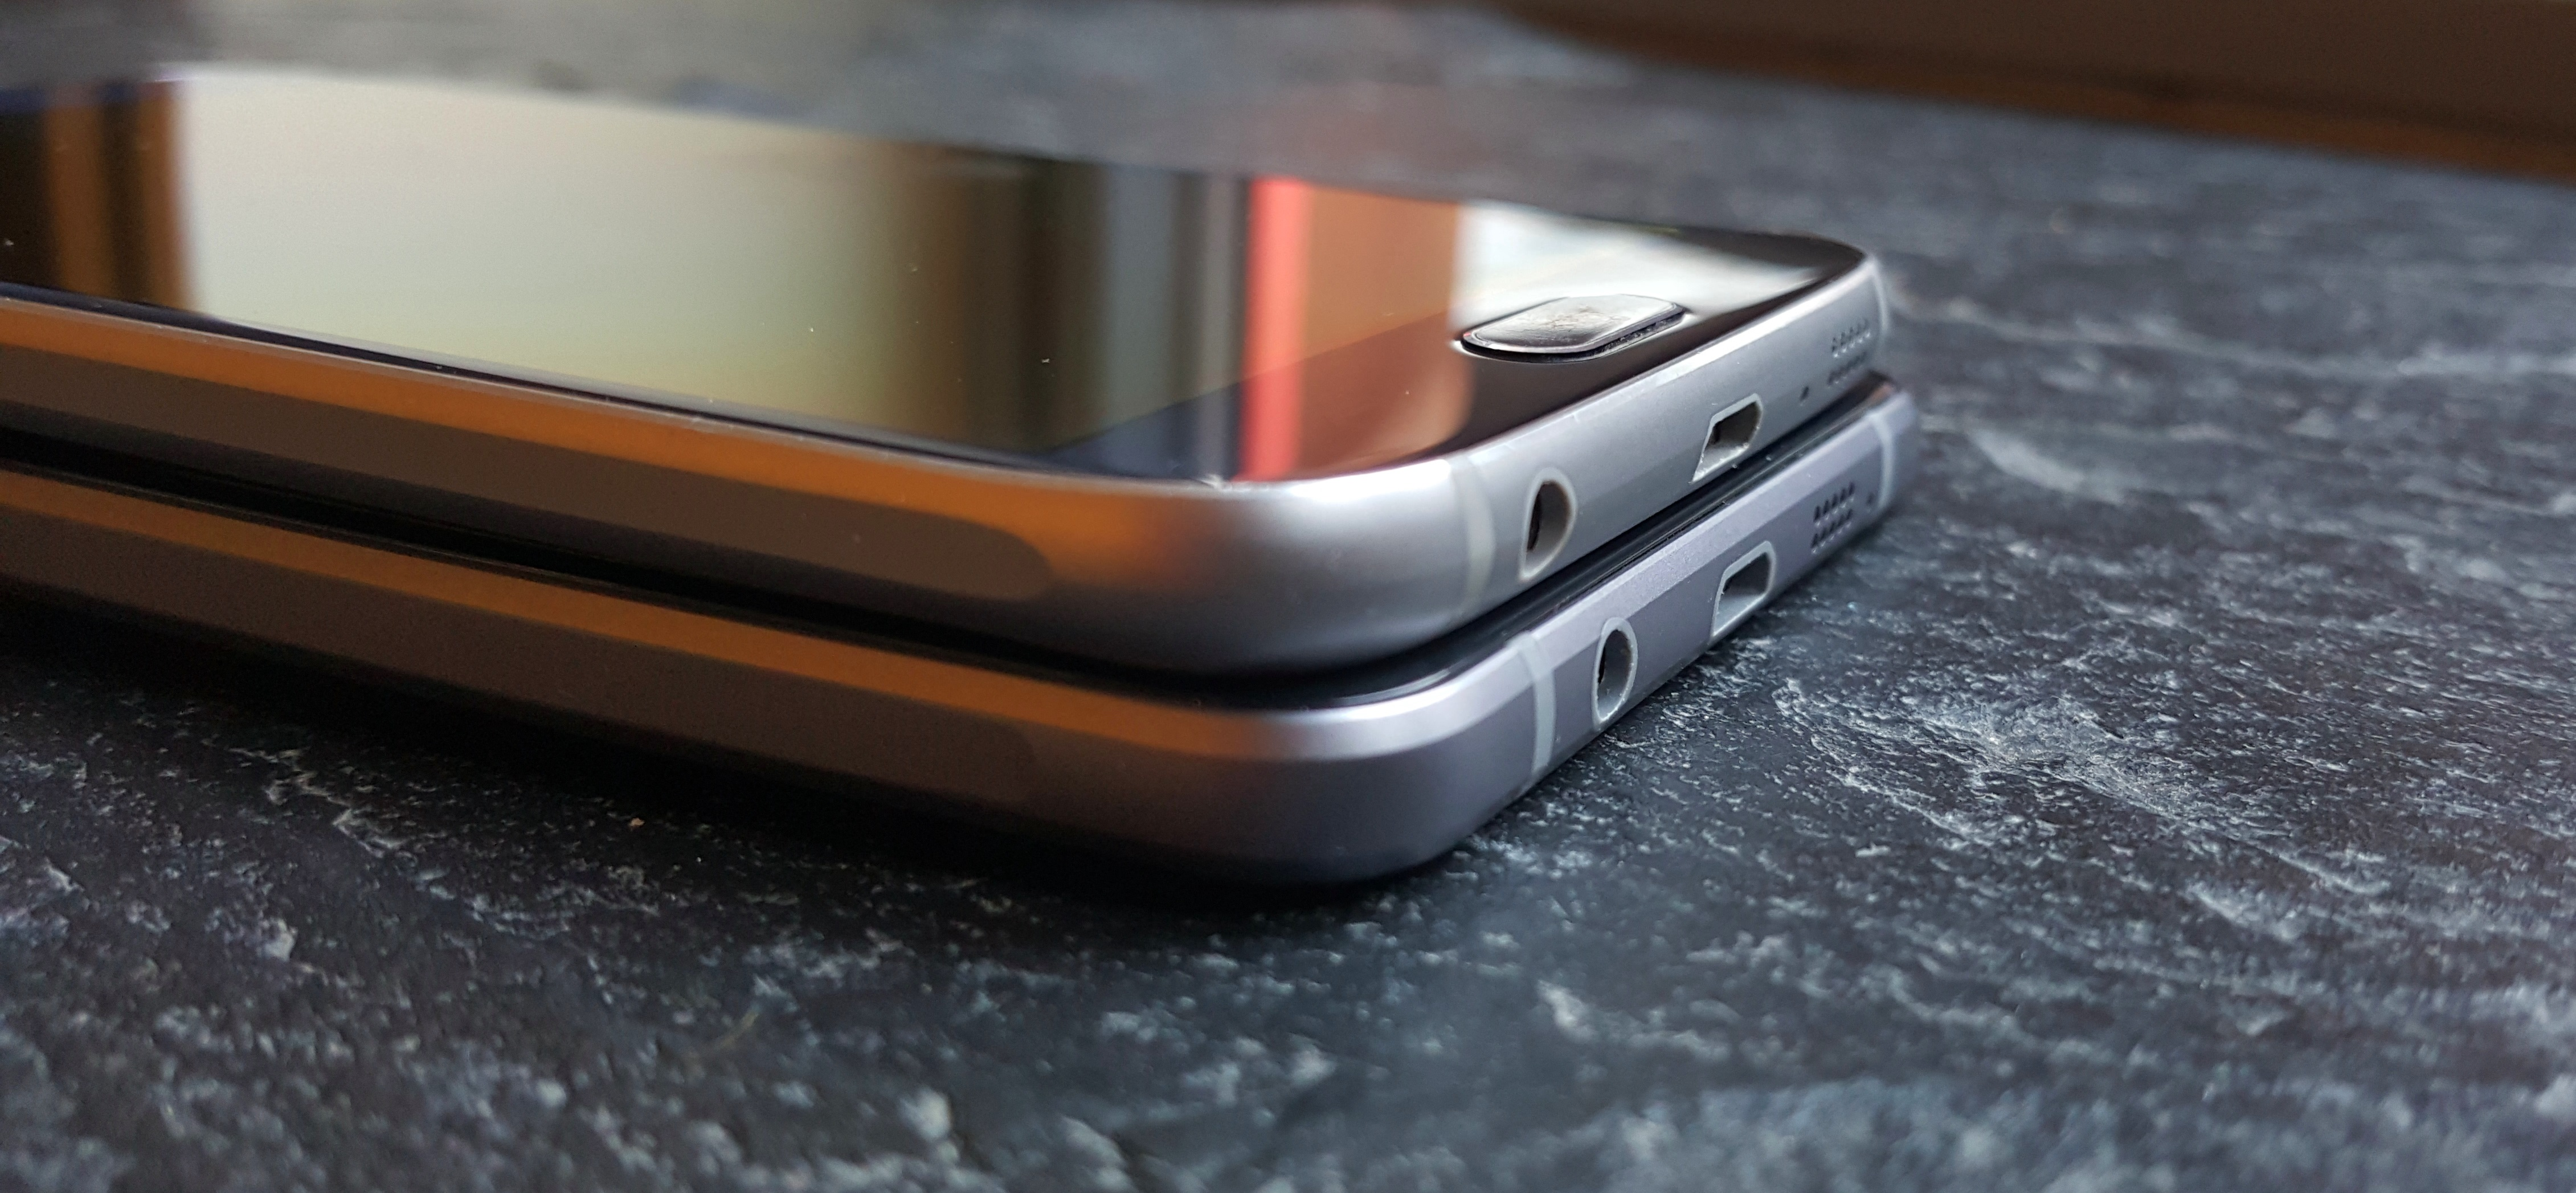 Samsung Galaxy A5 2016 Versus S6 Differences Similarities New Sm Ram 2 Memori 16gb Sammobile